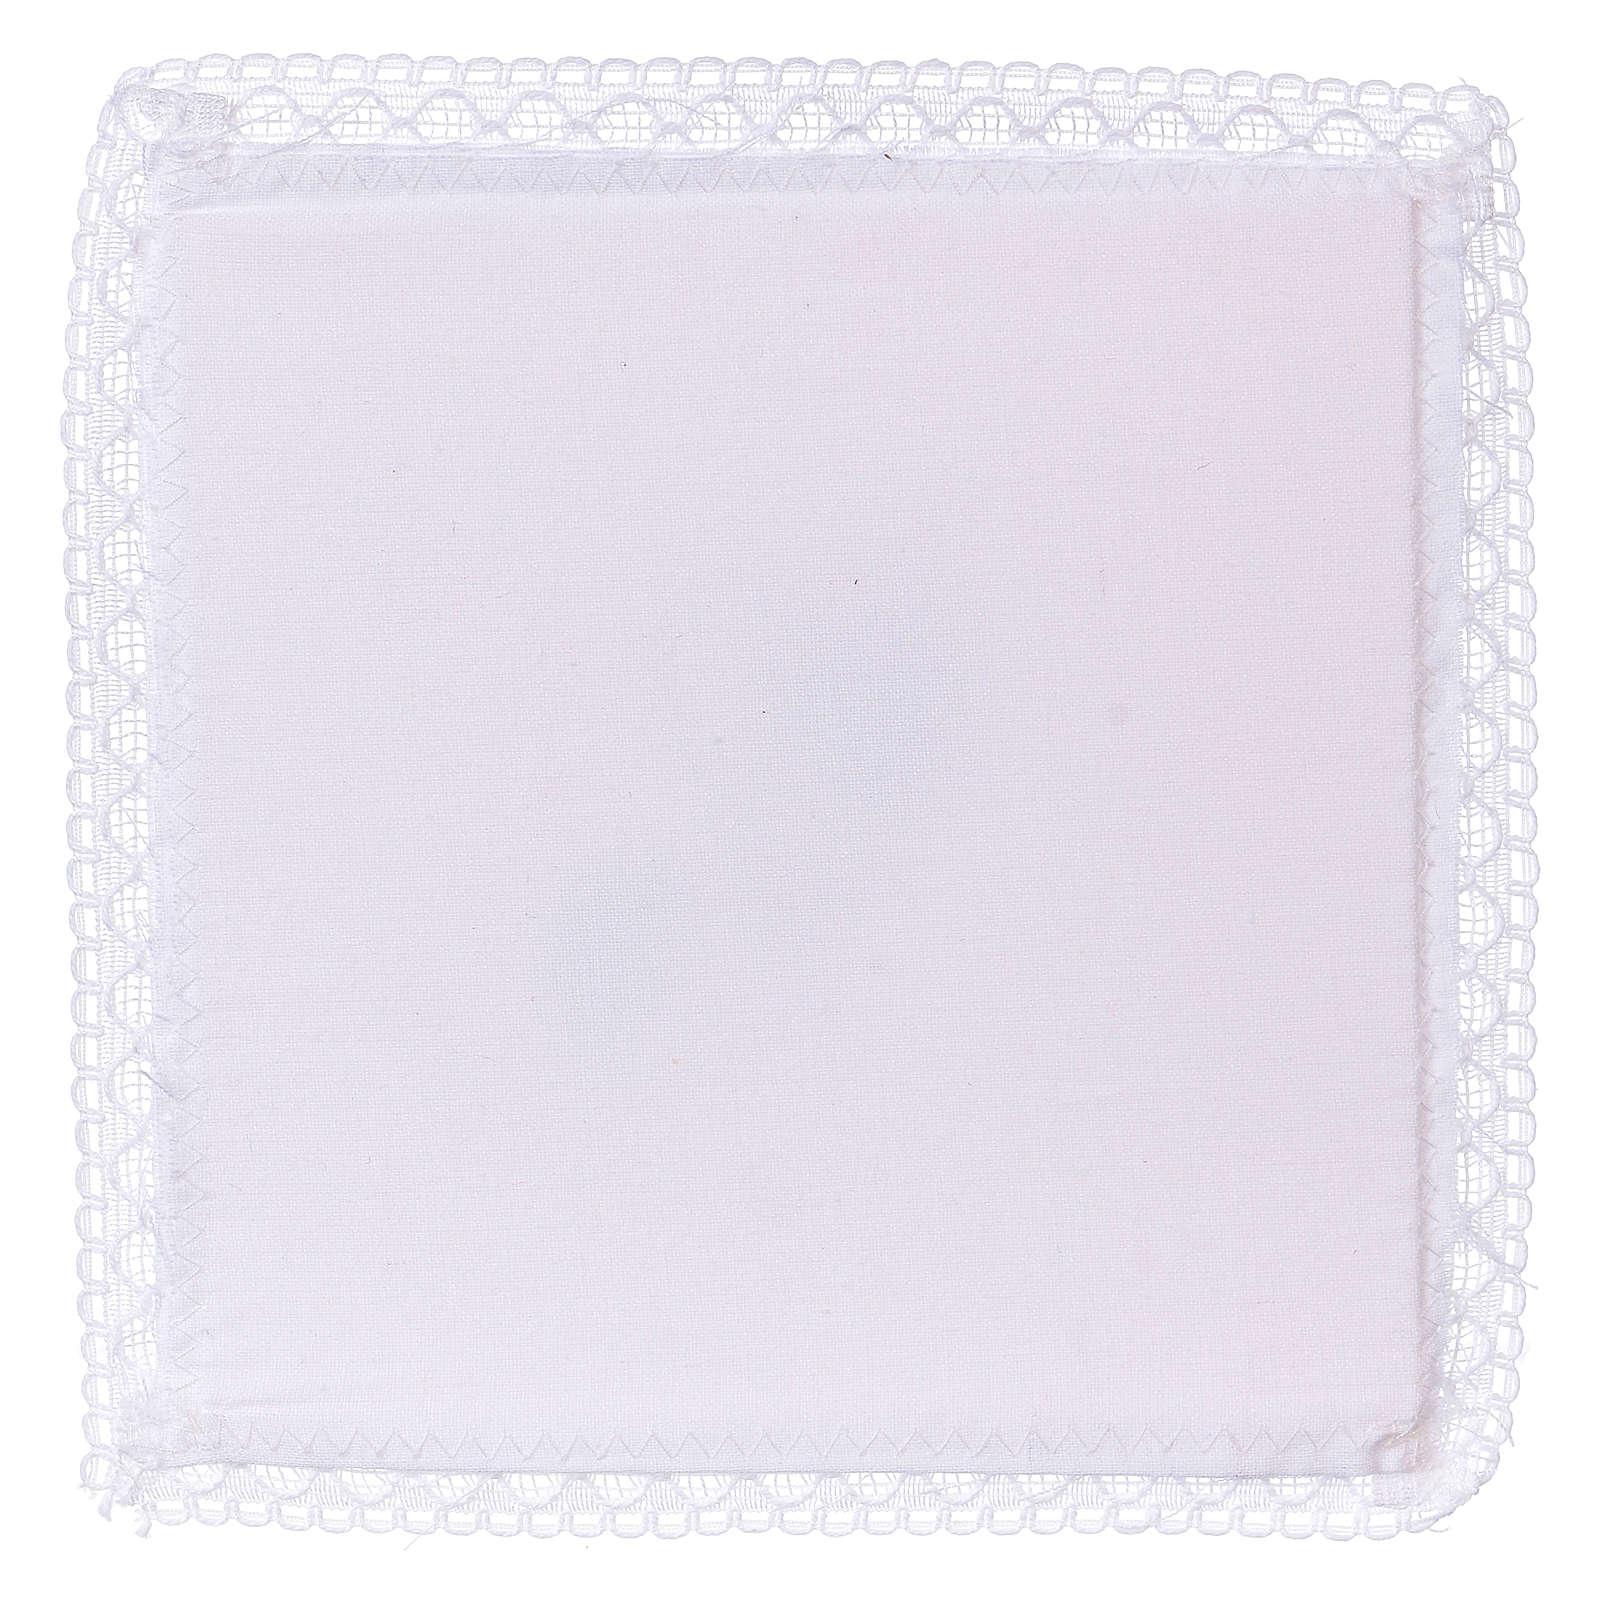 Pale rigide pour calice Chi-Rho 100% coton 4